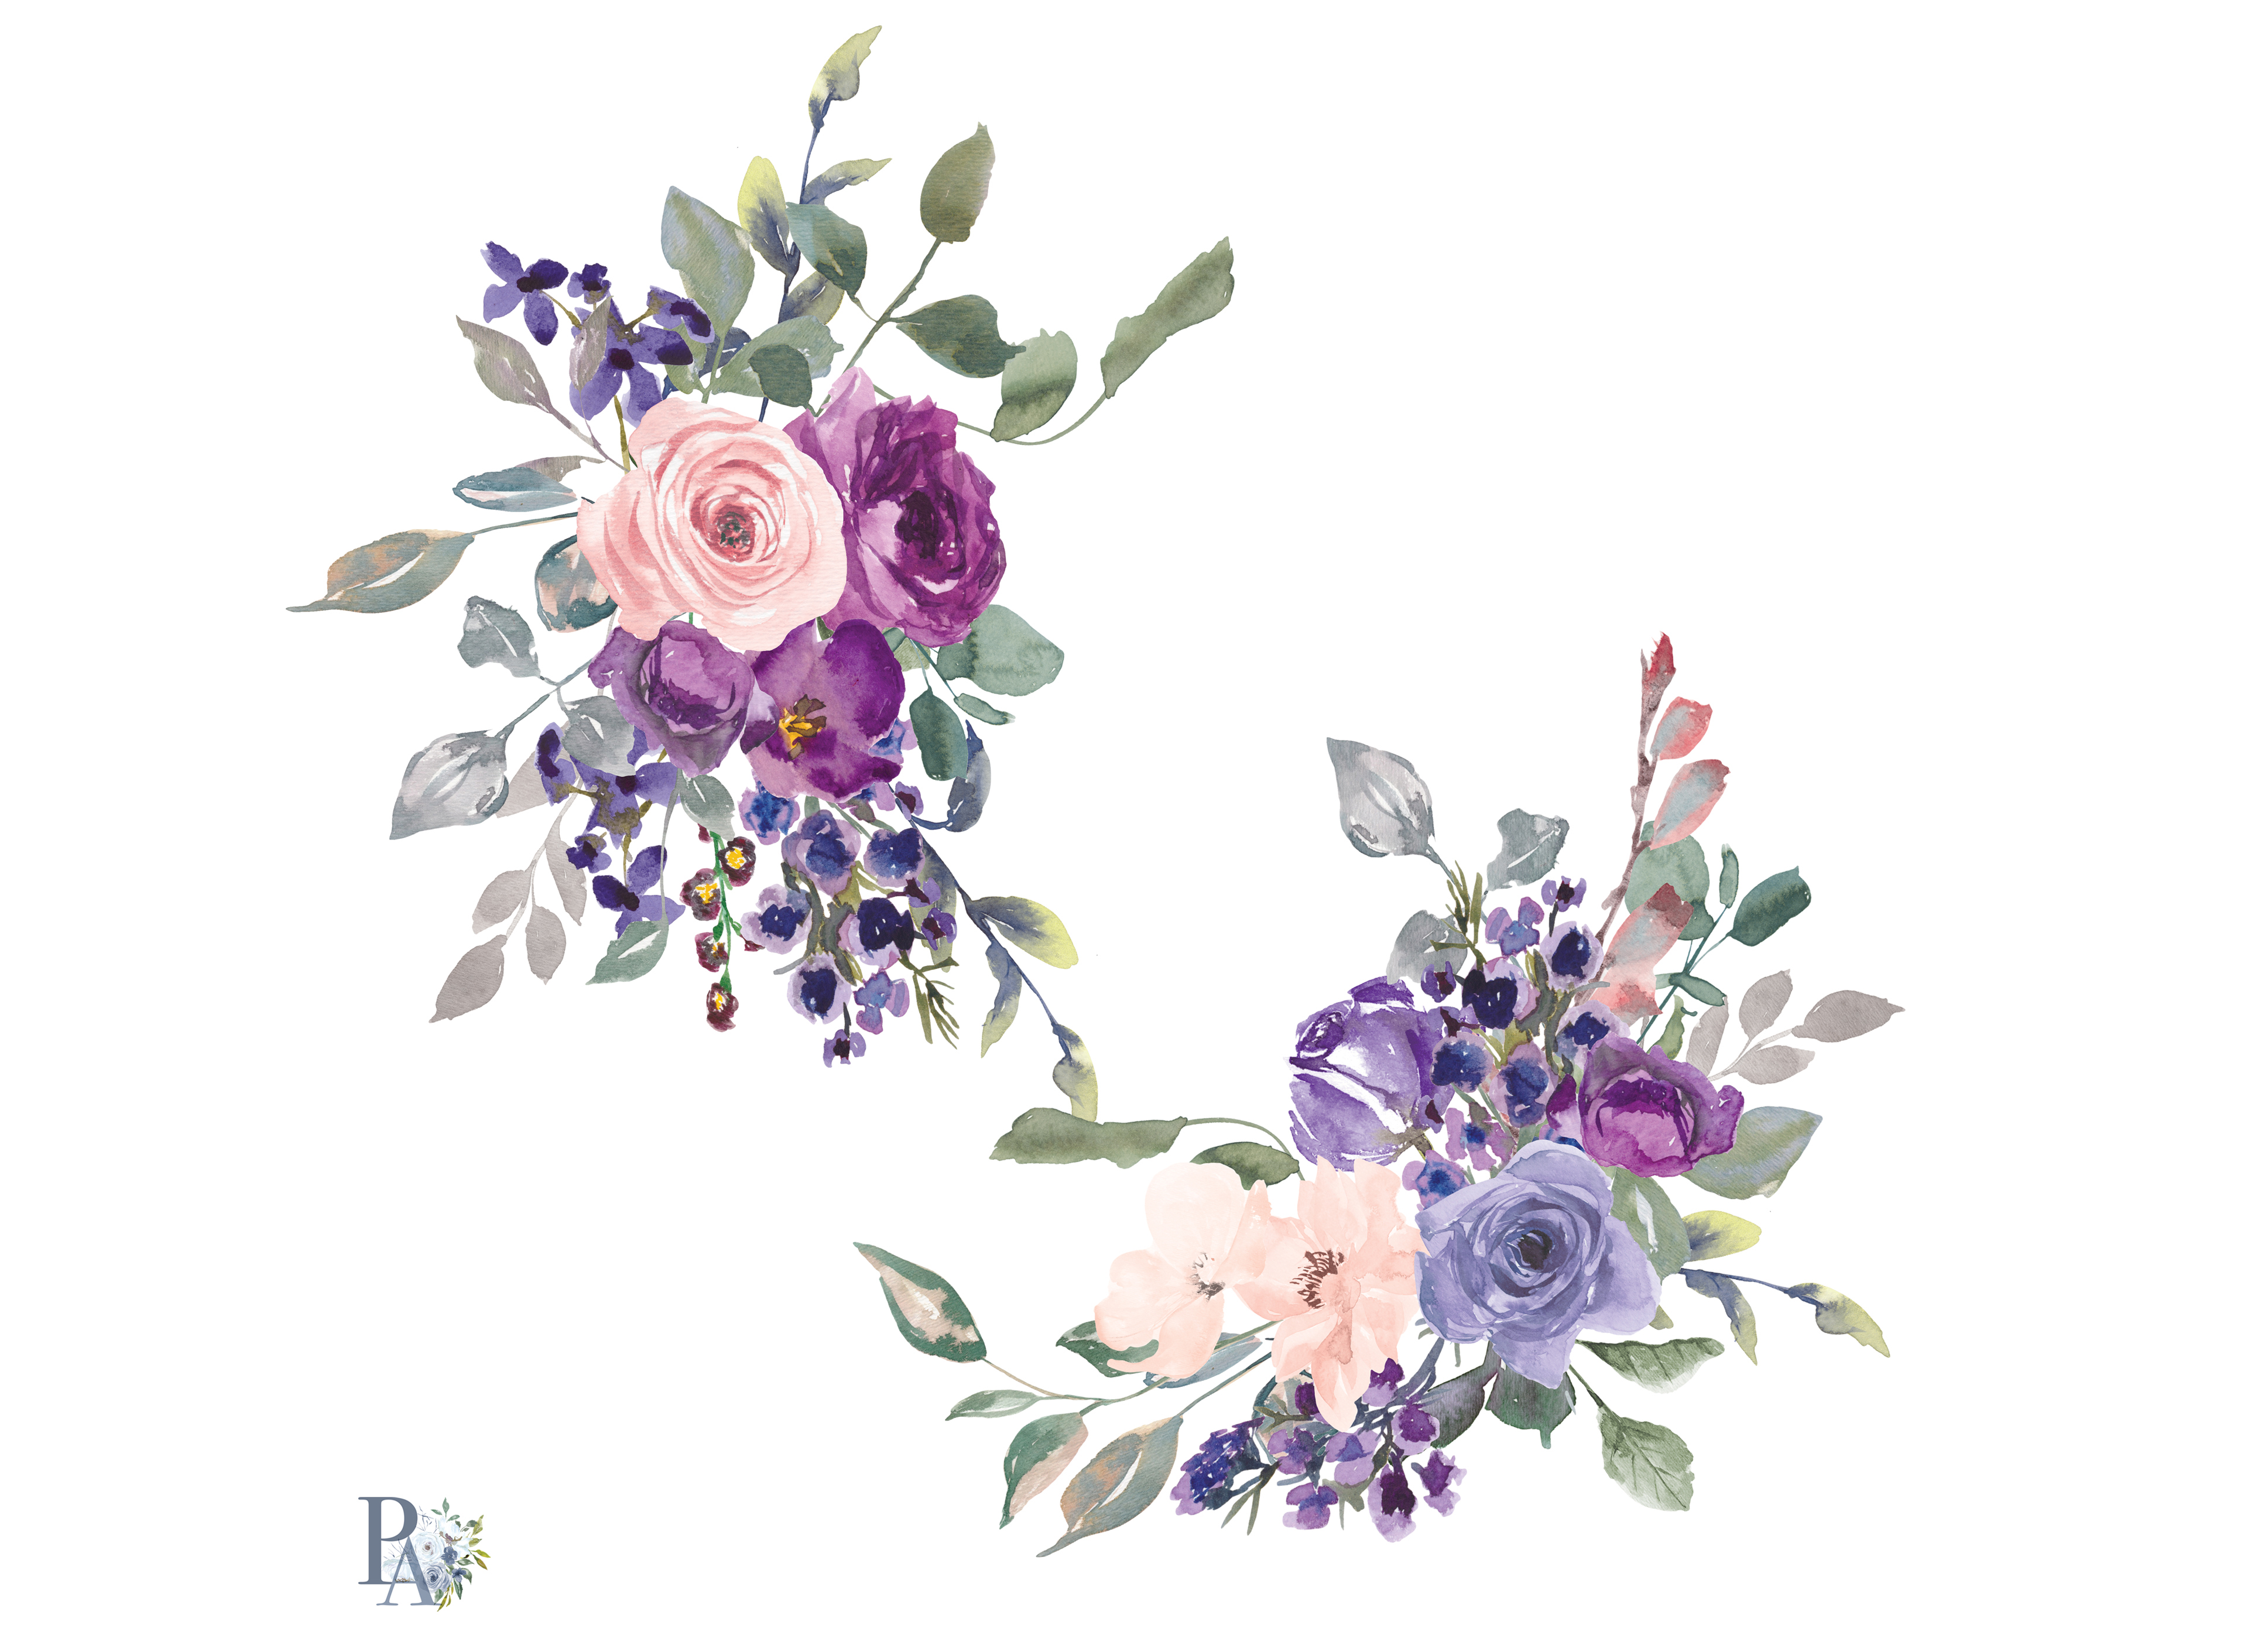 Top Pink Floral Watercolor Border